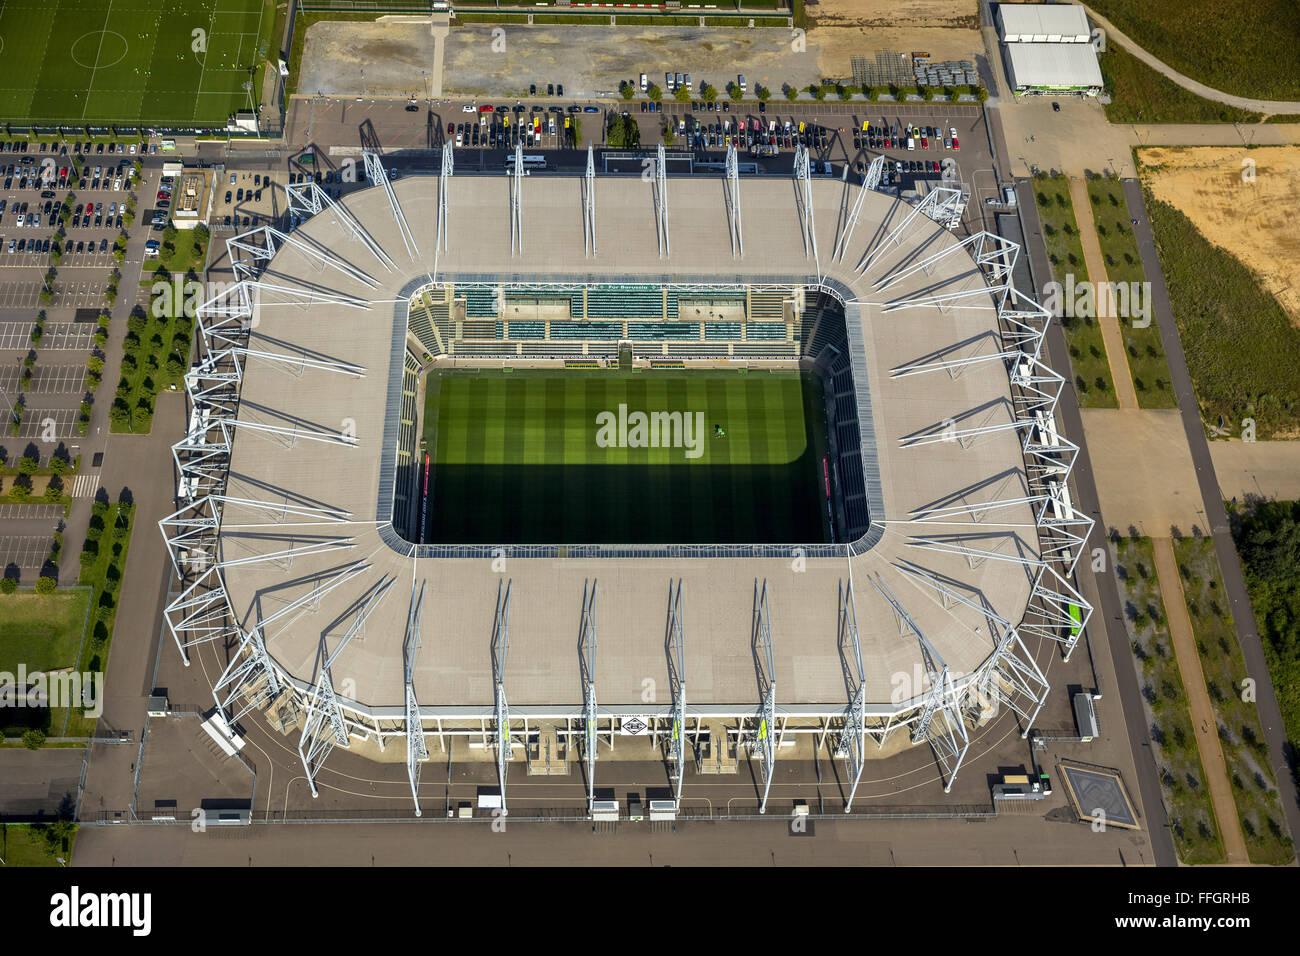 Aerial view, football stadium Mönchengladbach, BVB Moenchengladbach, Borussia Park, PREMIERE league stadium; - Stock Image